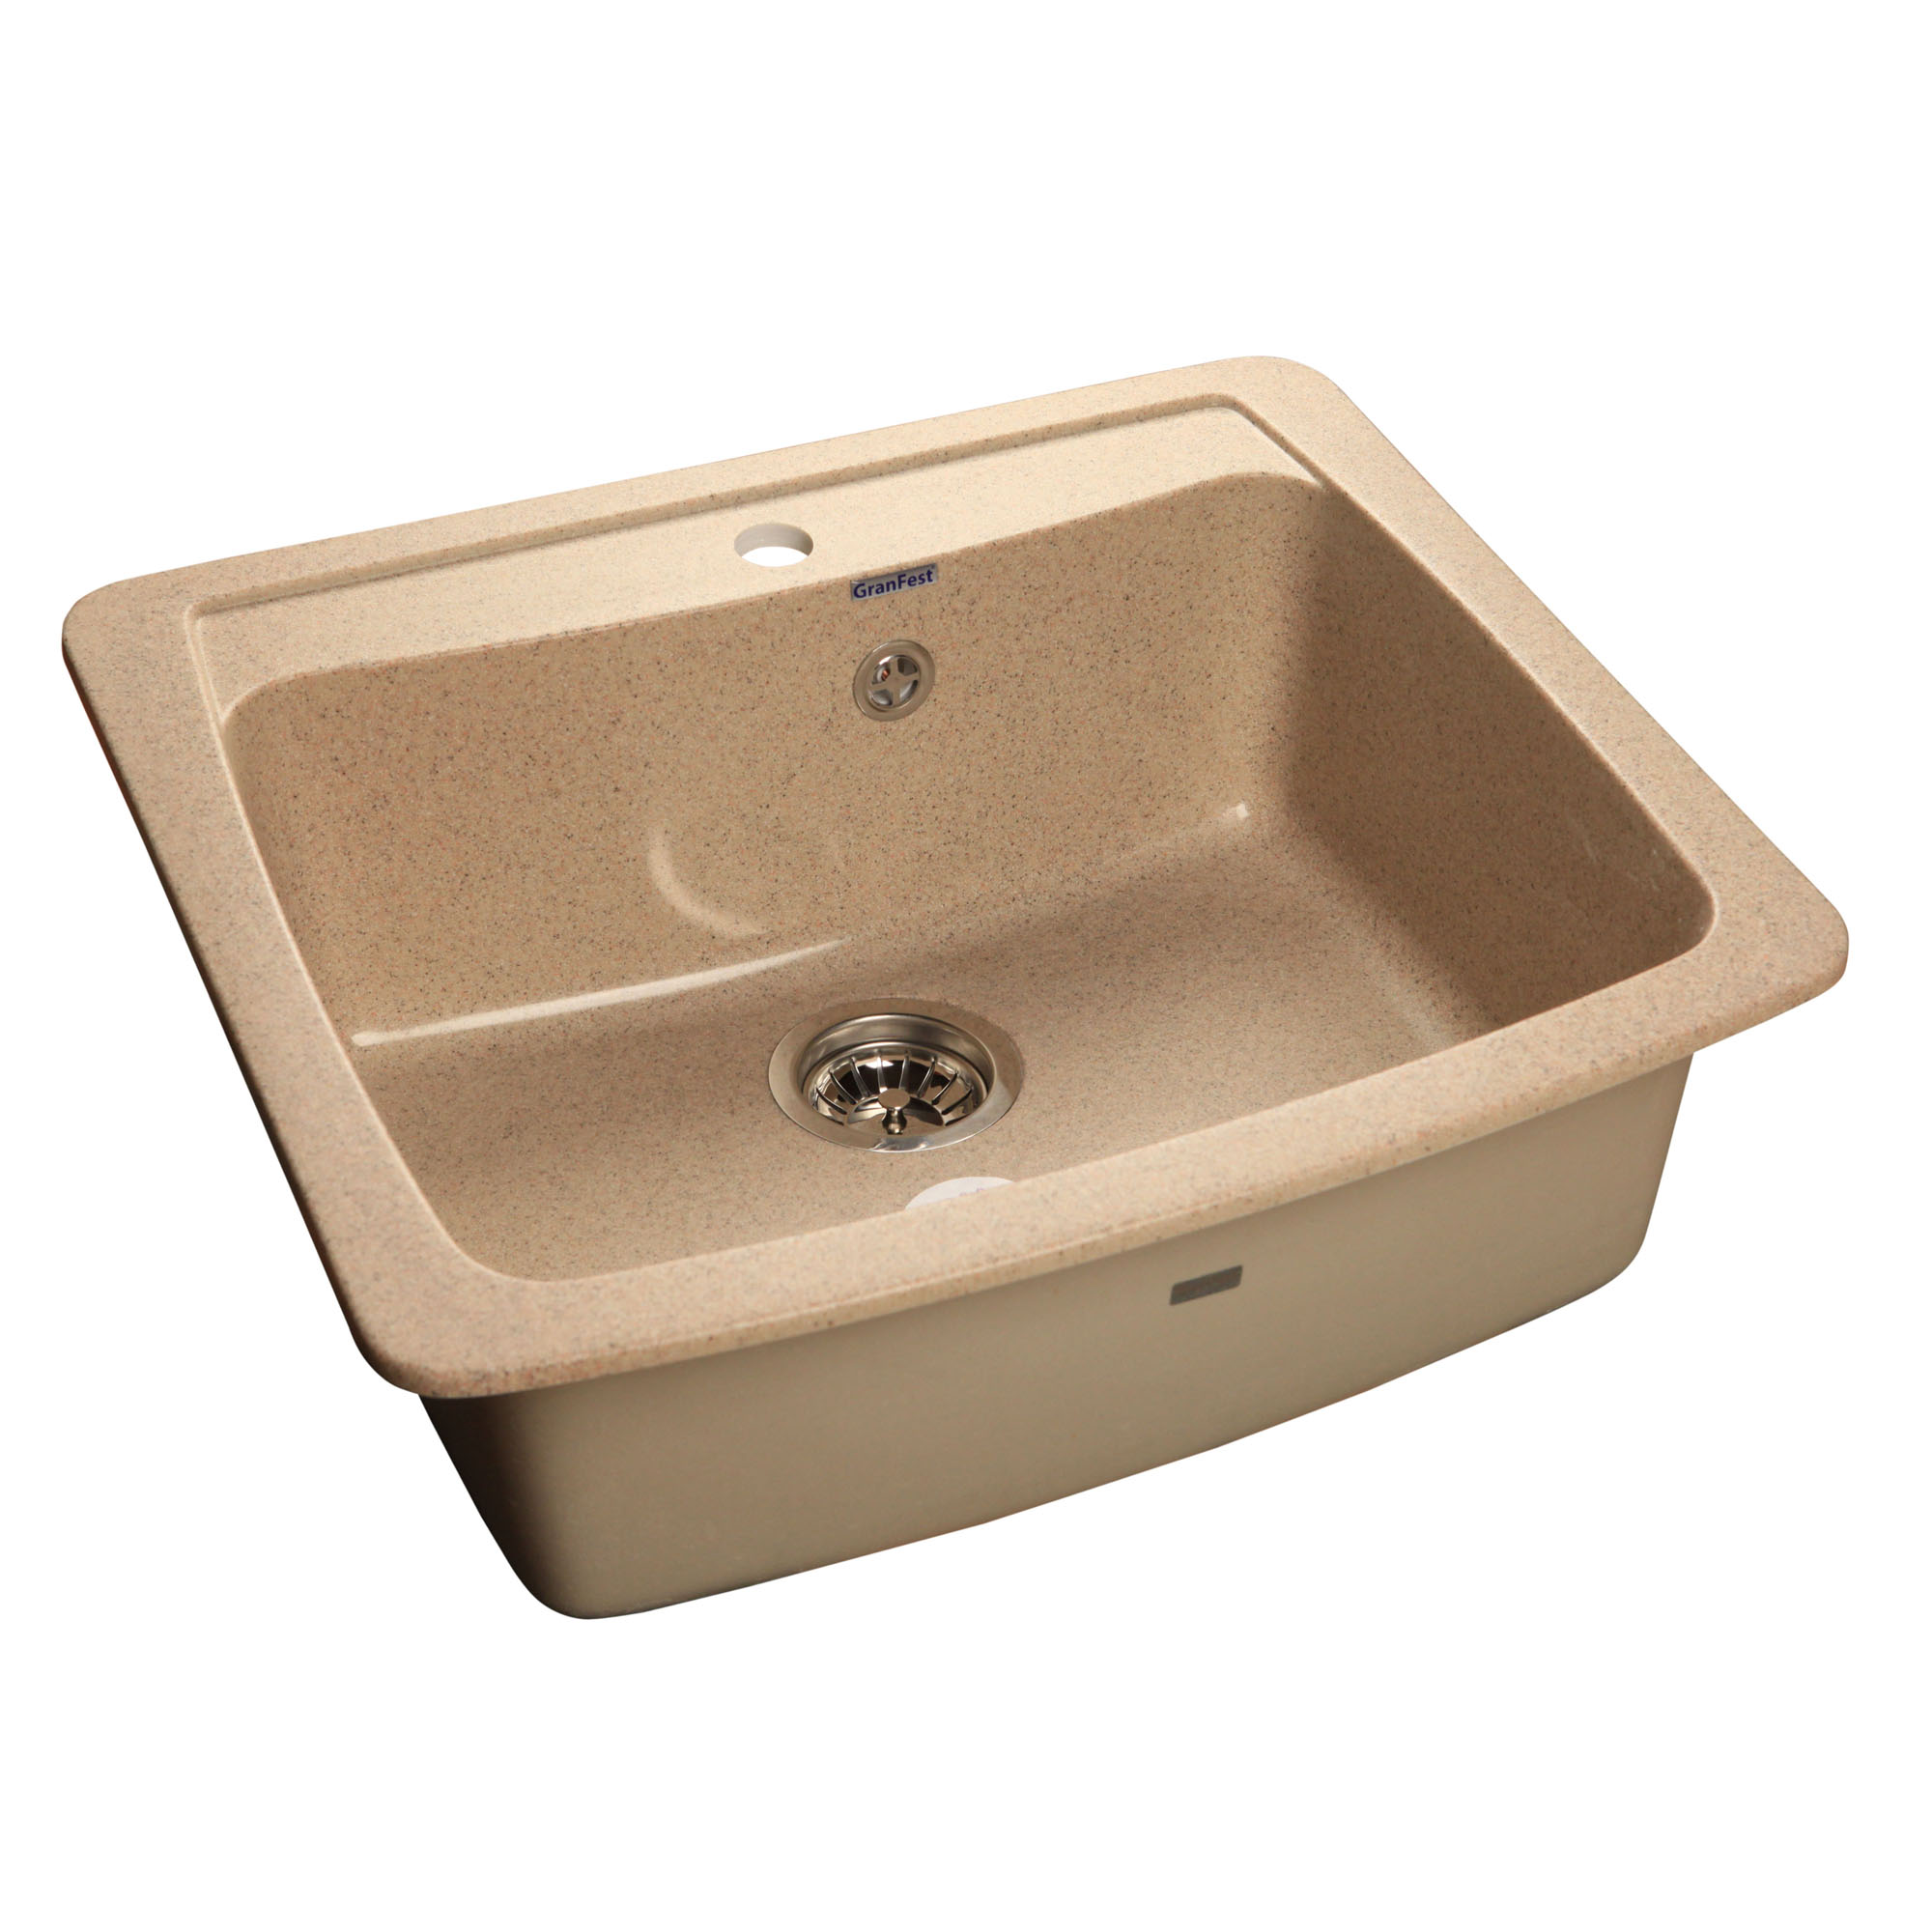 Кухонная мойка GranFest Standart GF-S605 песочный мойка кухонная granfest гранит 605x510 gf s605 бежевая